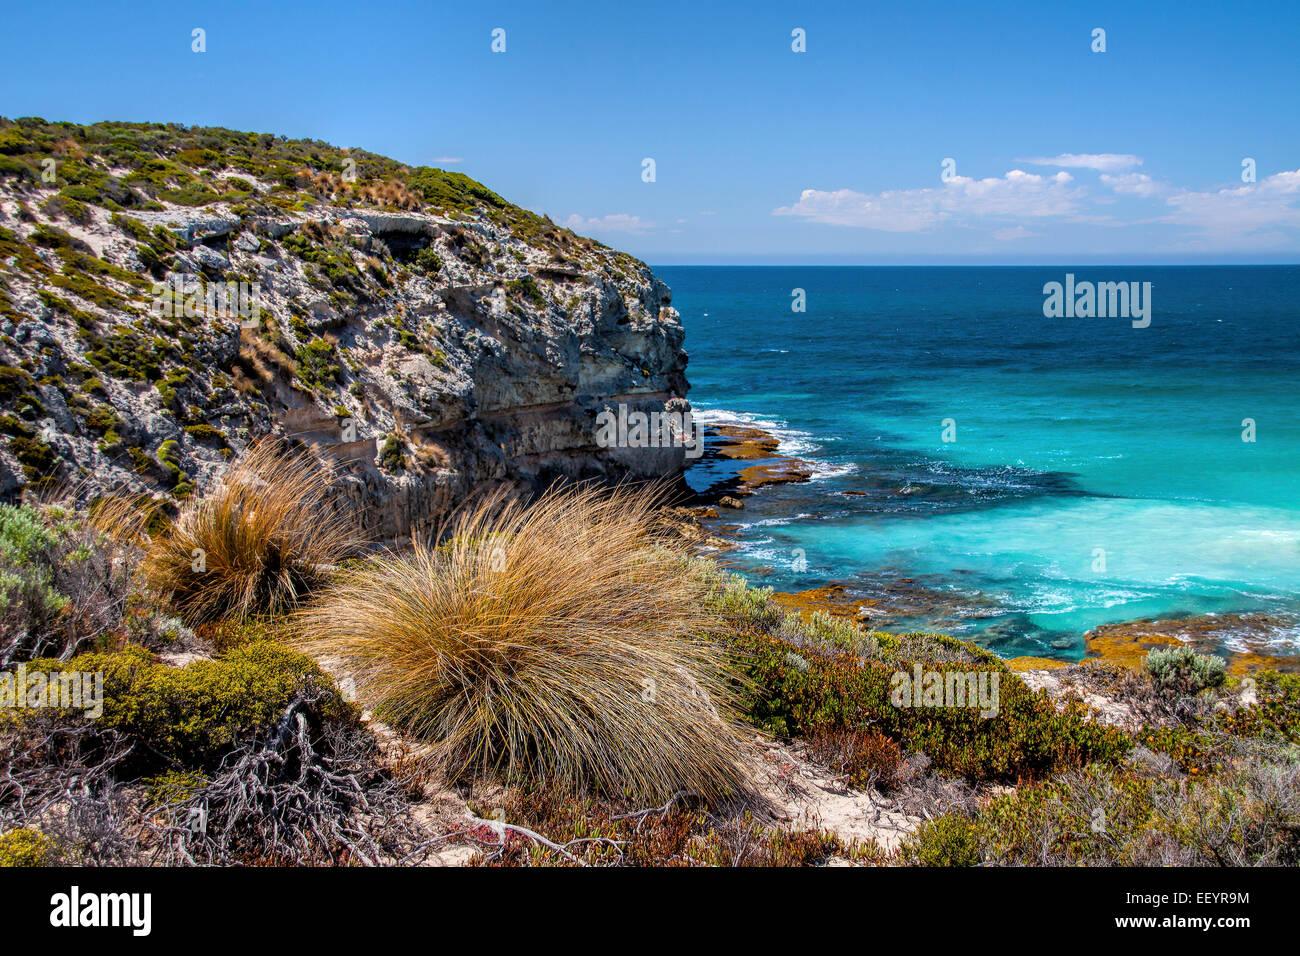 low tide, kangaroo island, ocean scene, beach, beach scenery, Stock Photo